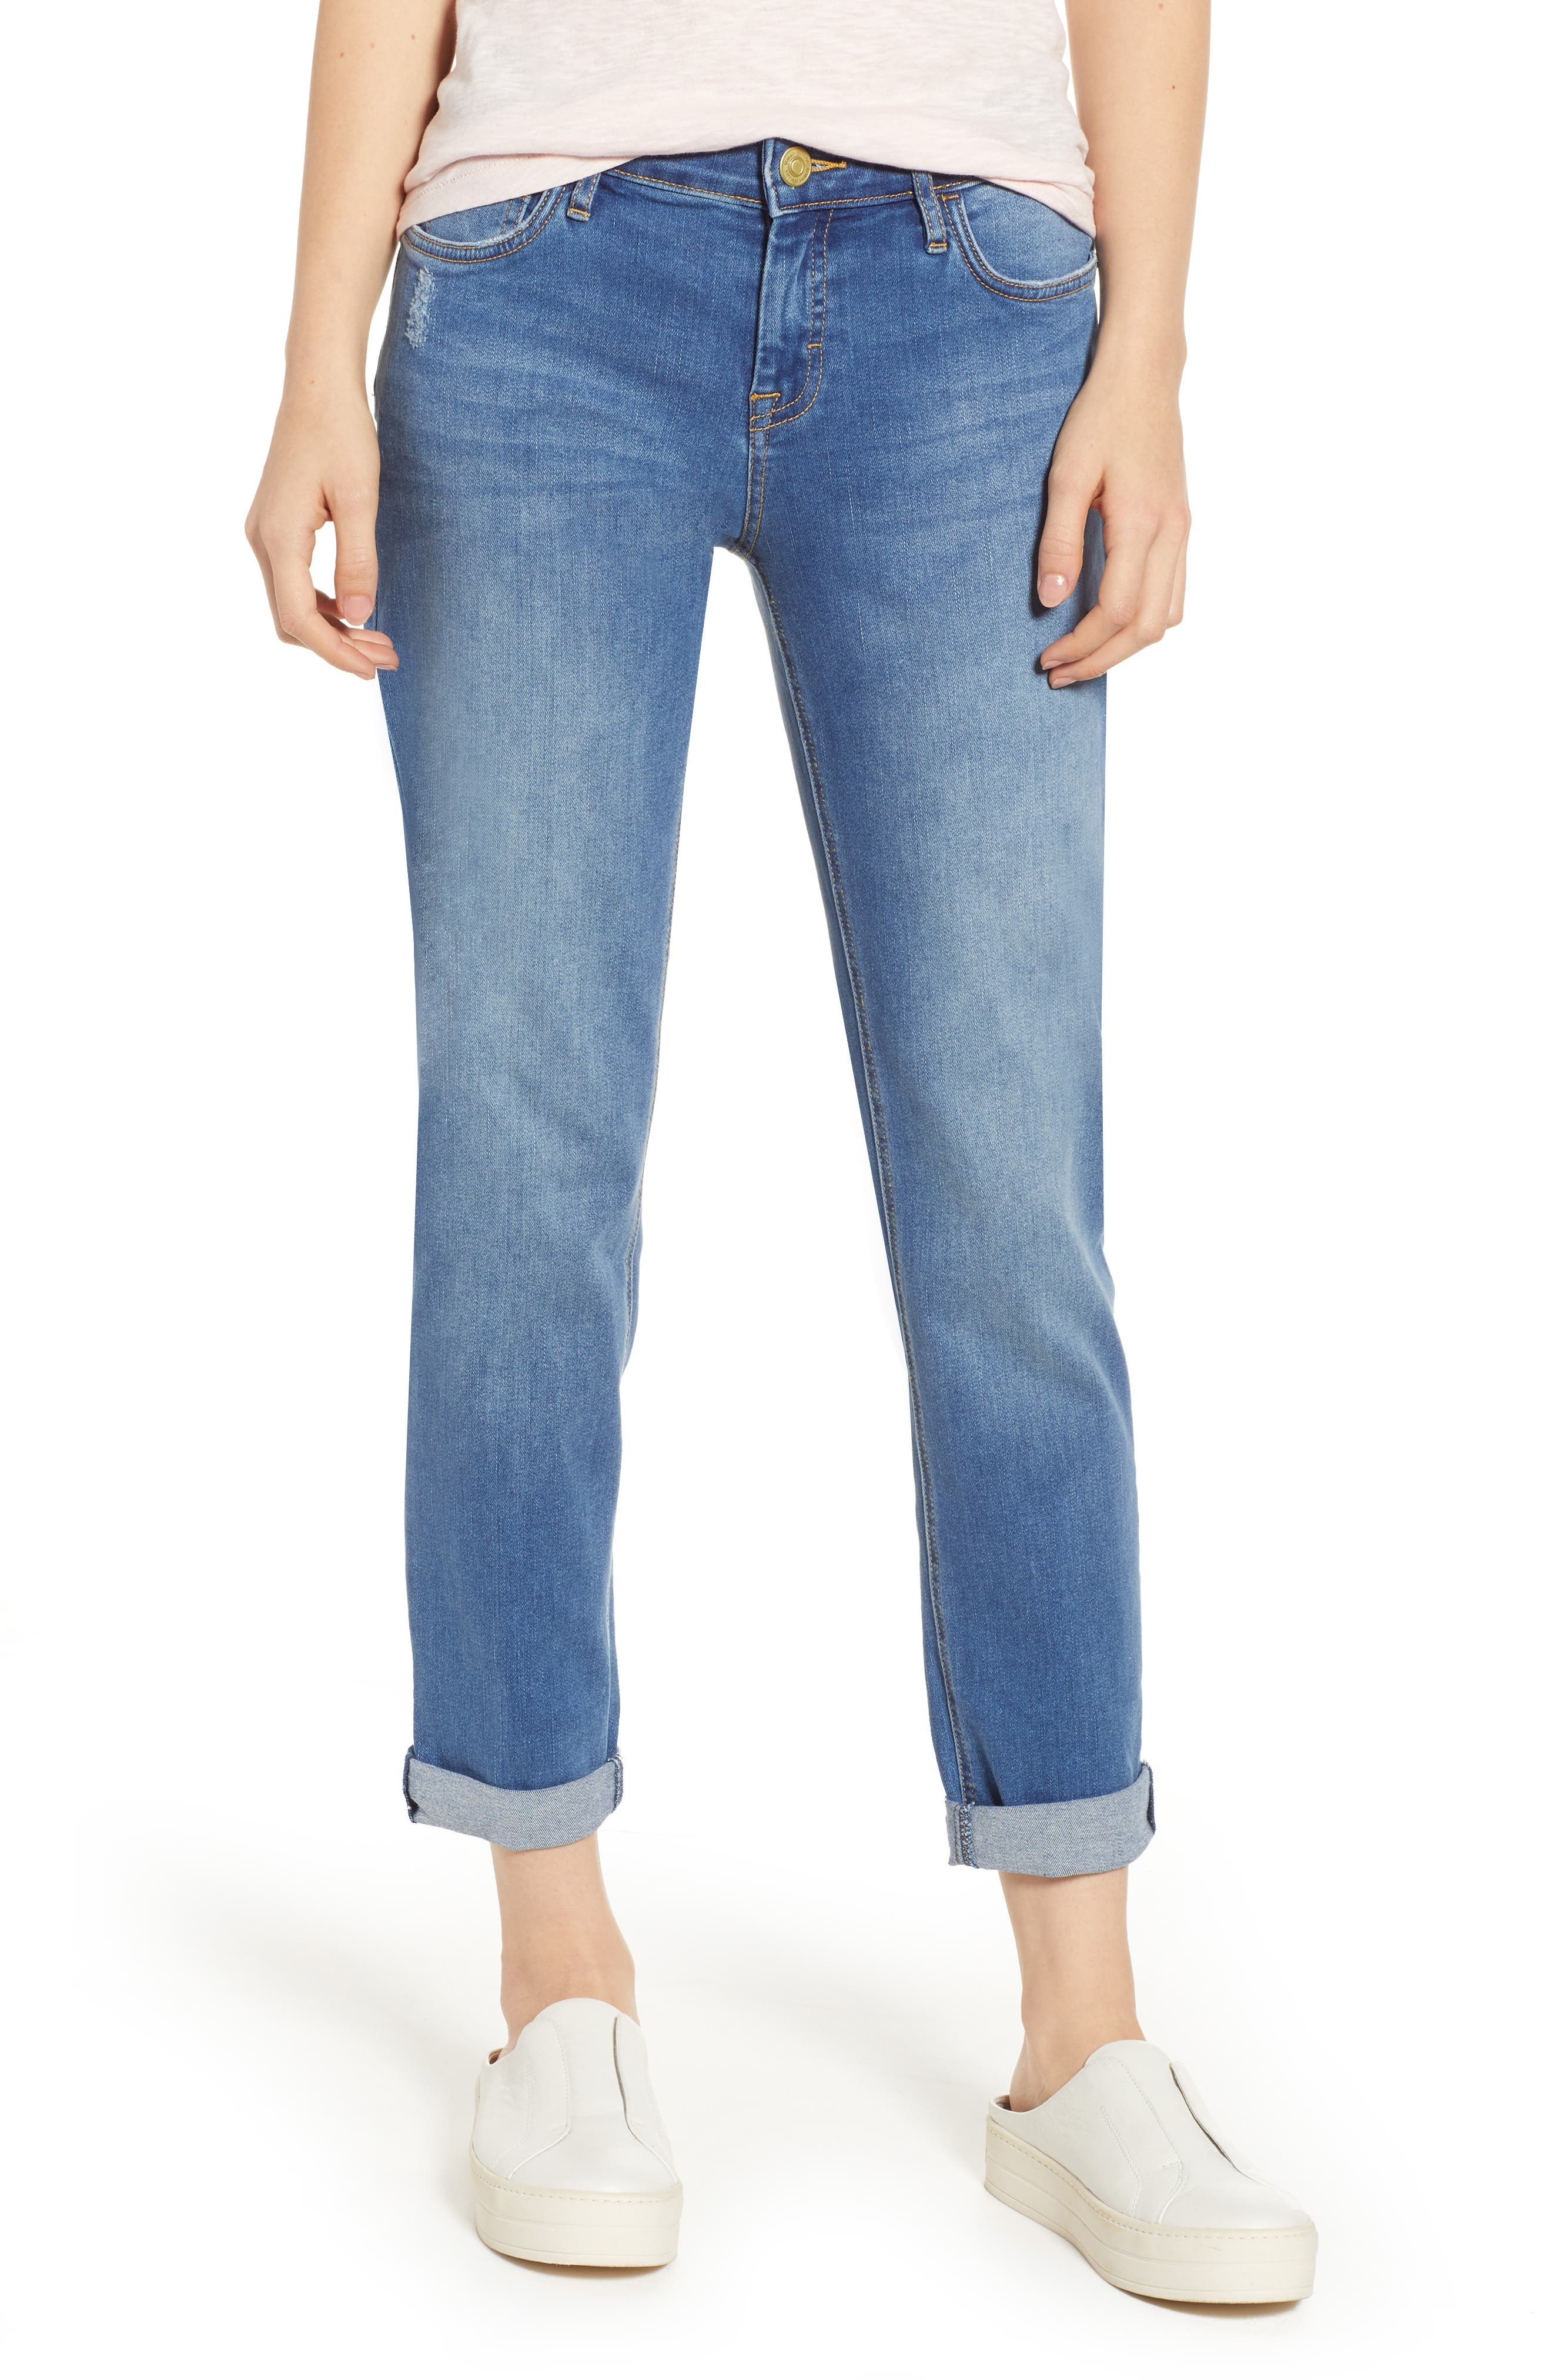 TOMMY BAHAMA Tema Slim Boyfriend Jeans, Main, color, DARK INDIGO WASH